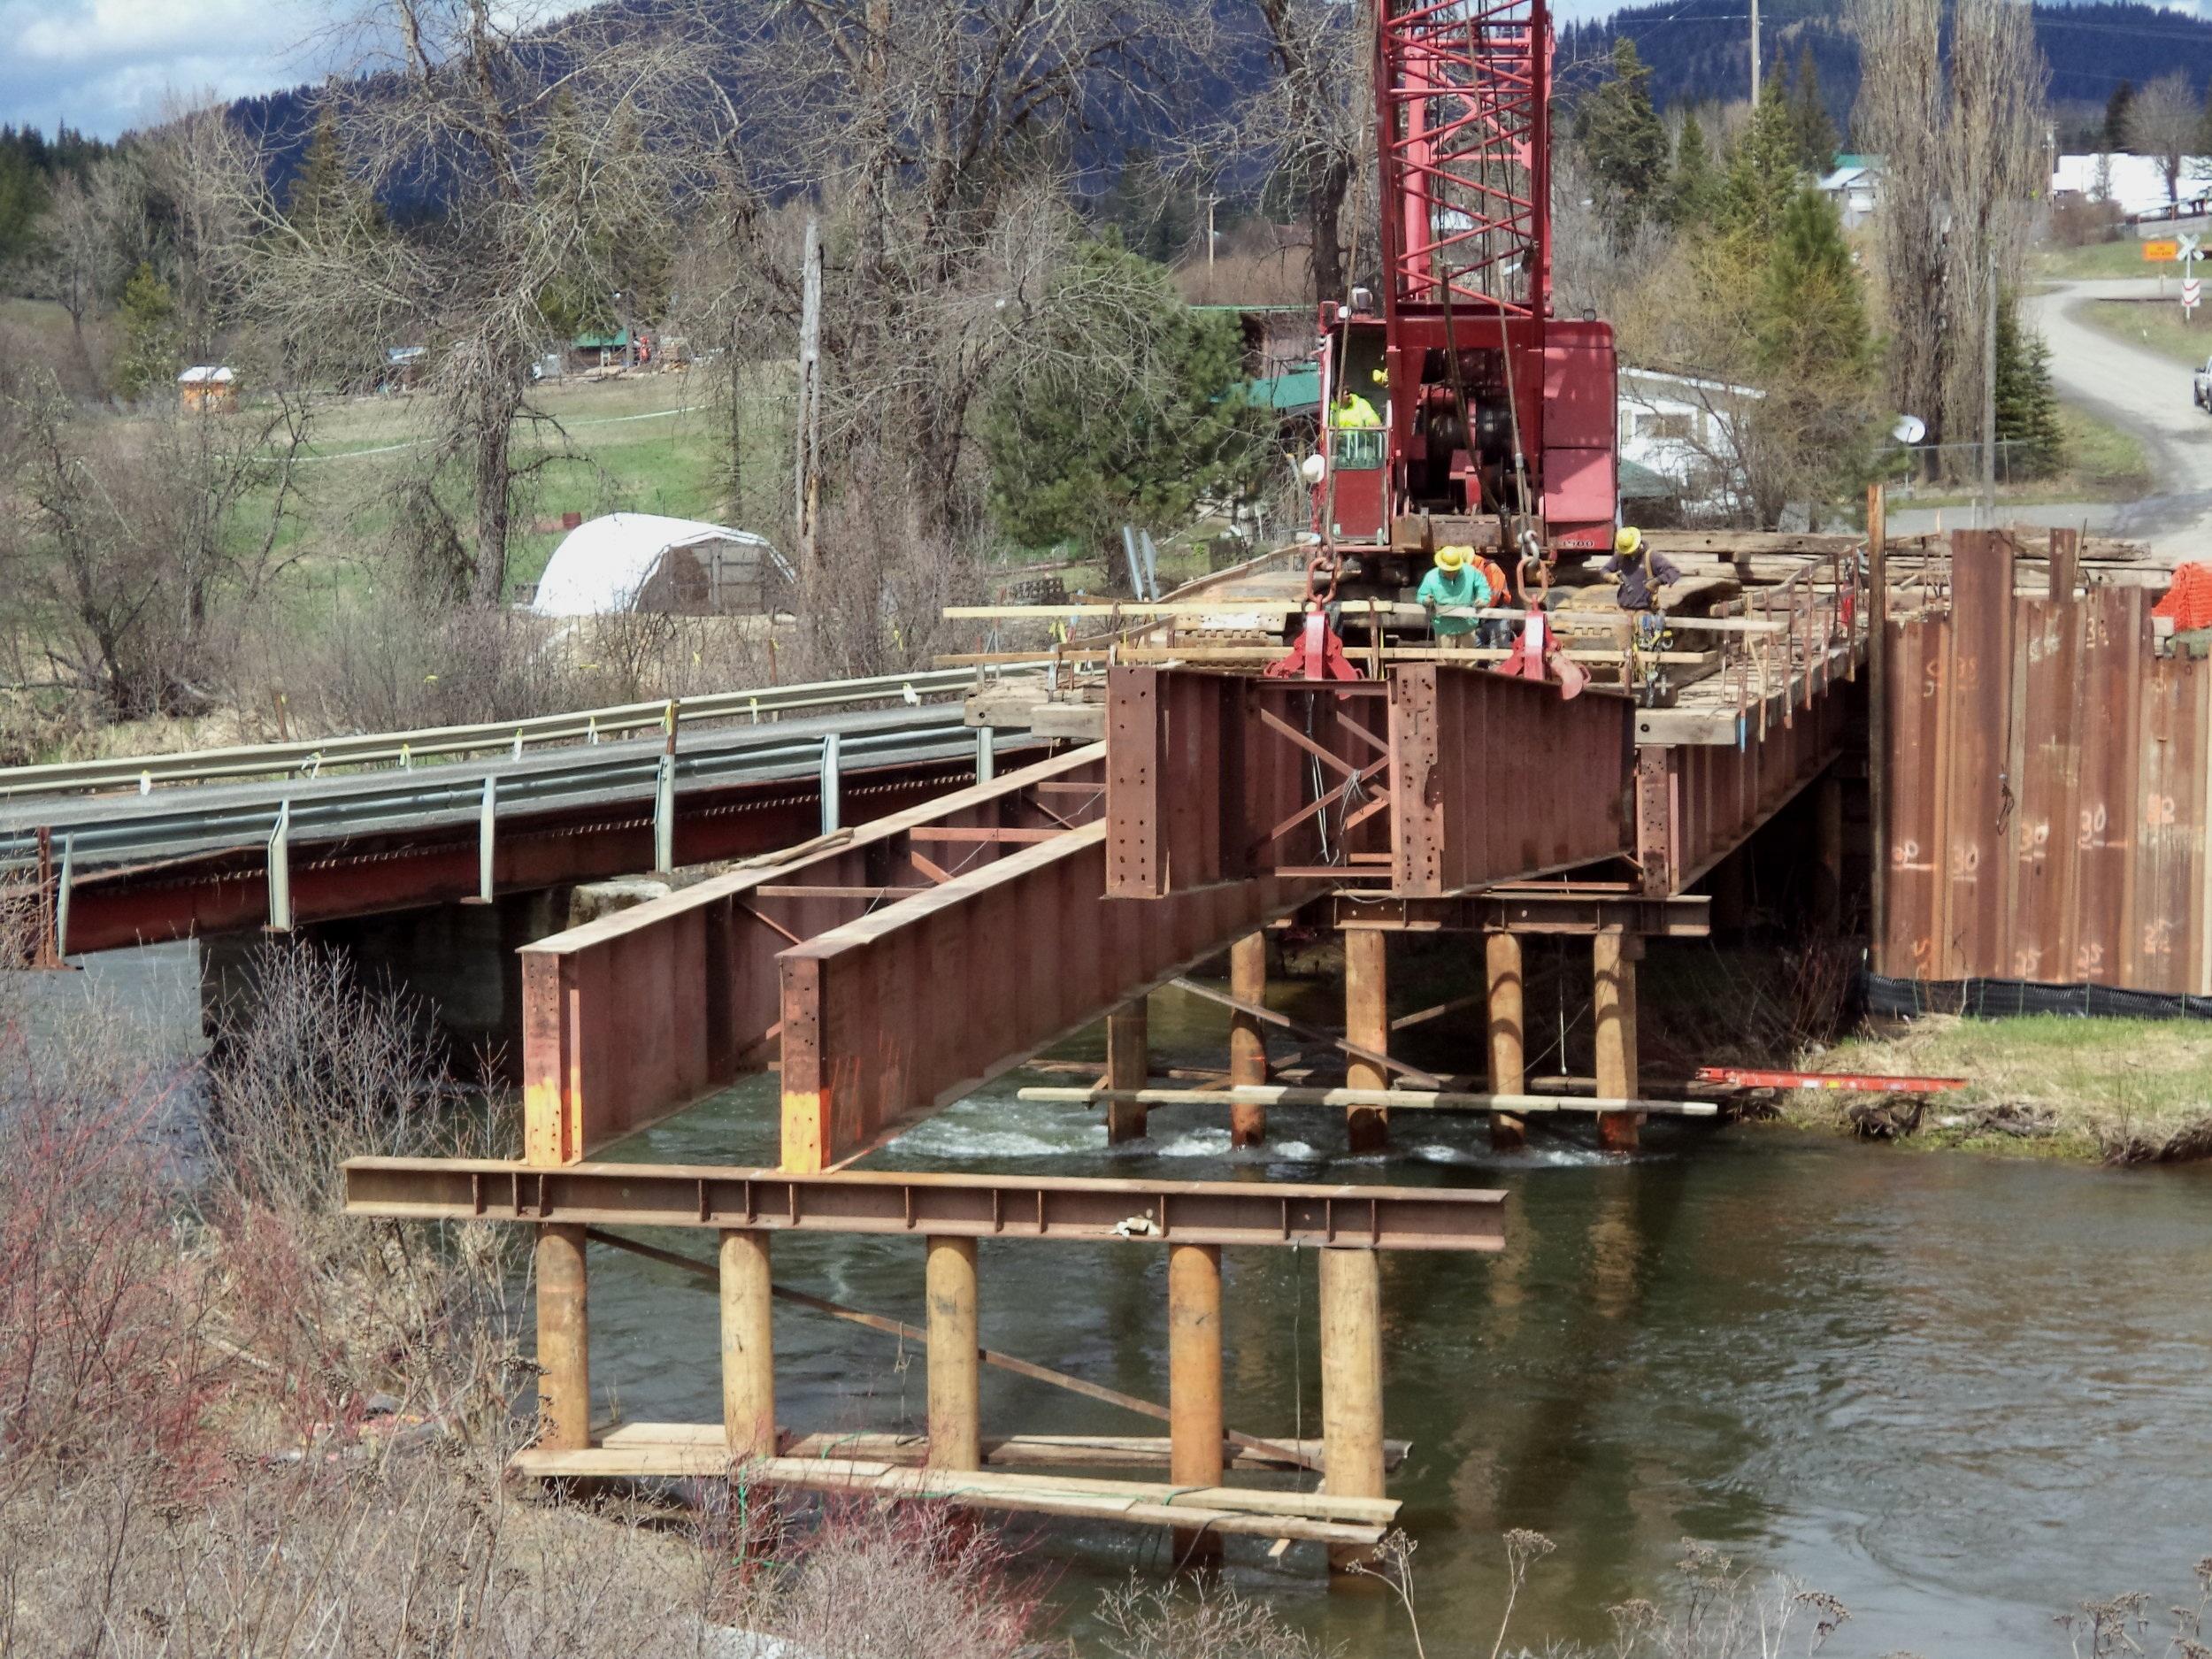 Carpenter+Creek%2C+Fernwood%2C+Old+Country+Road+Bridge%2C+by+Pat+Conro.jpg